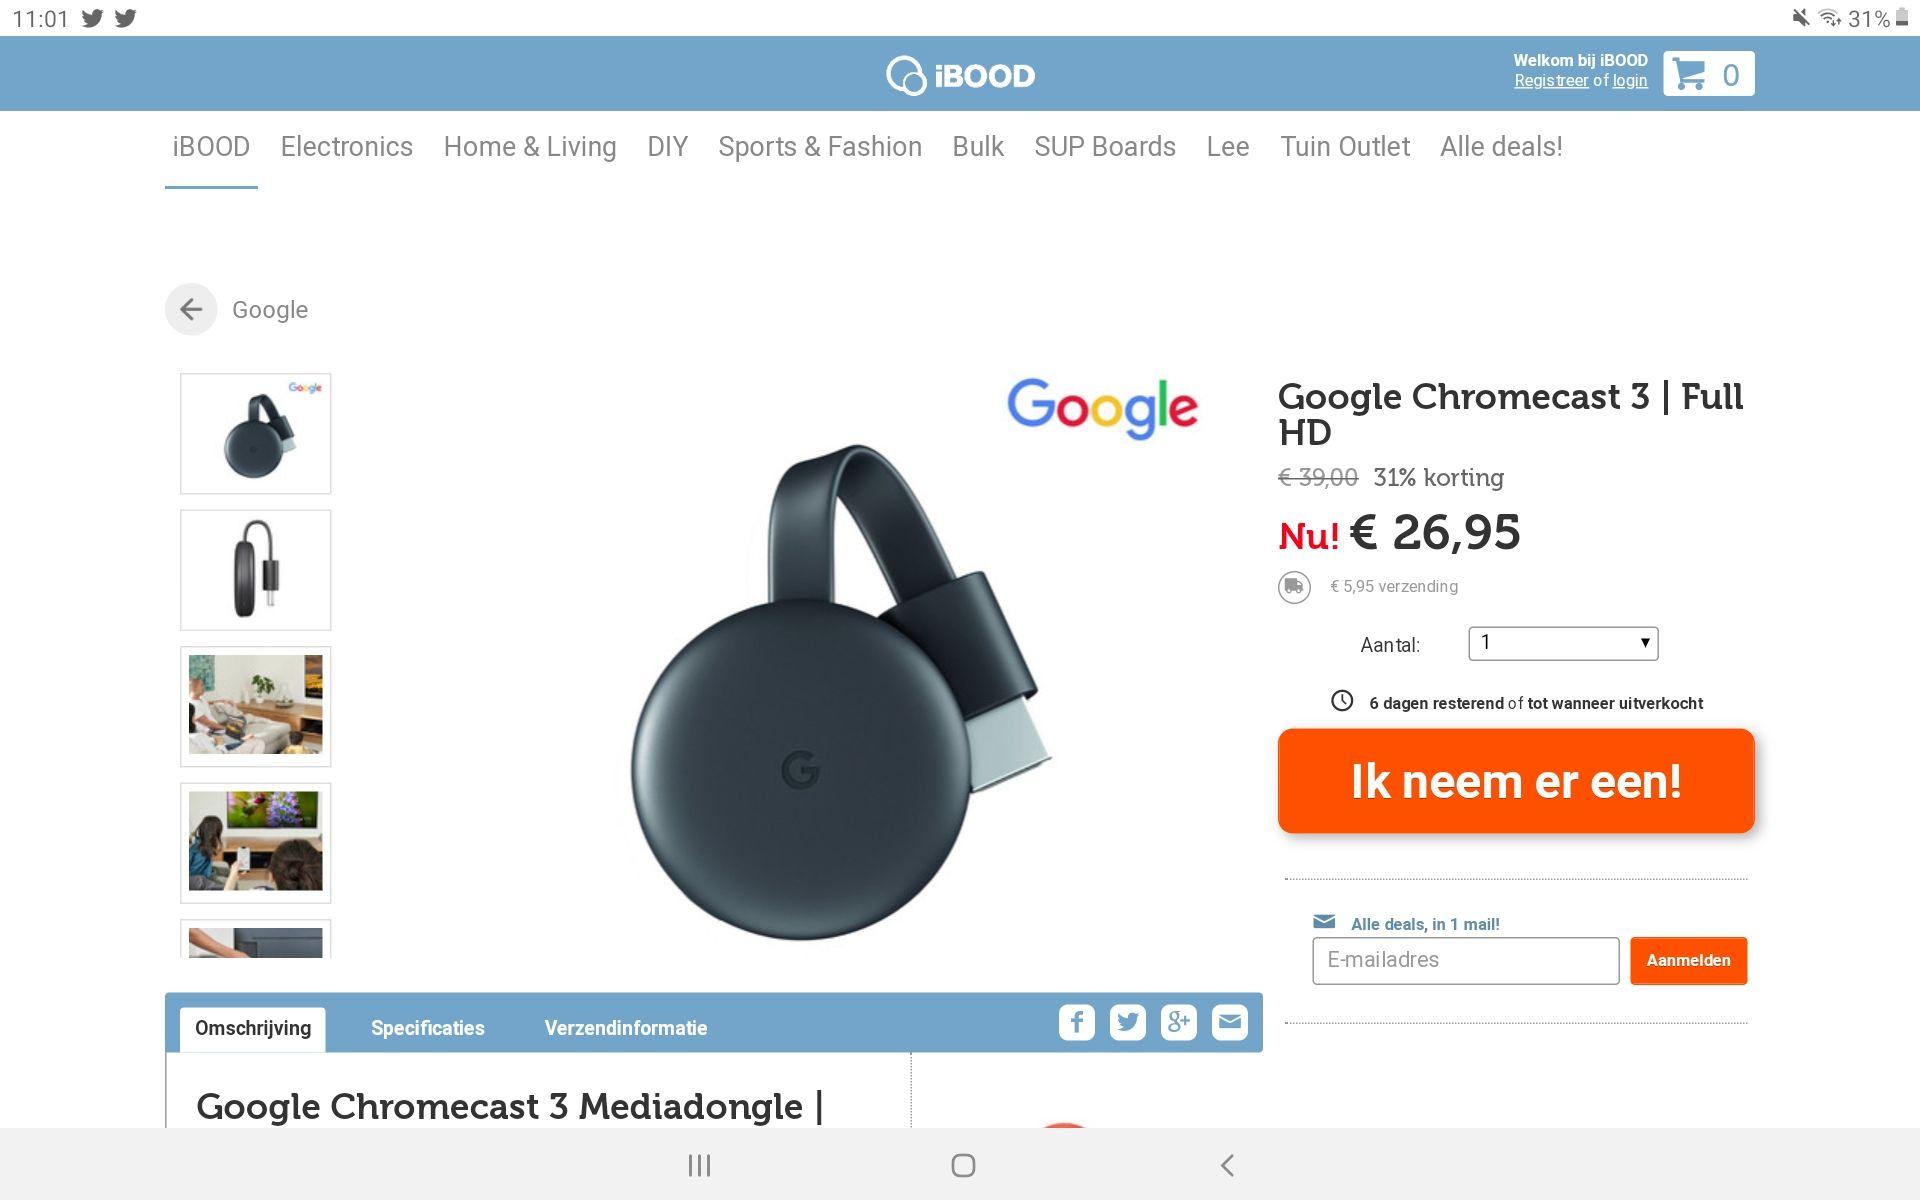 Chromecast V3 nu 32,90 inclusief verzen bij Ibood